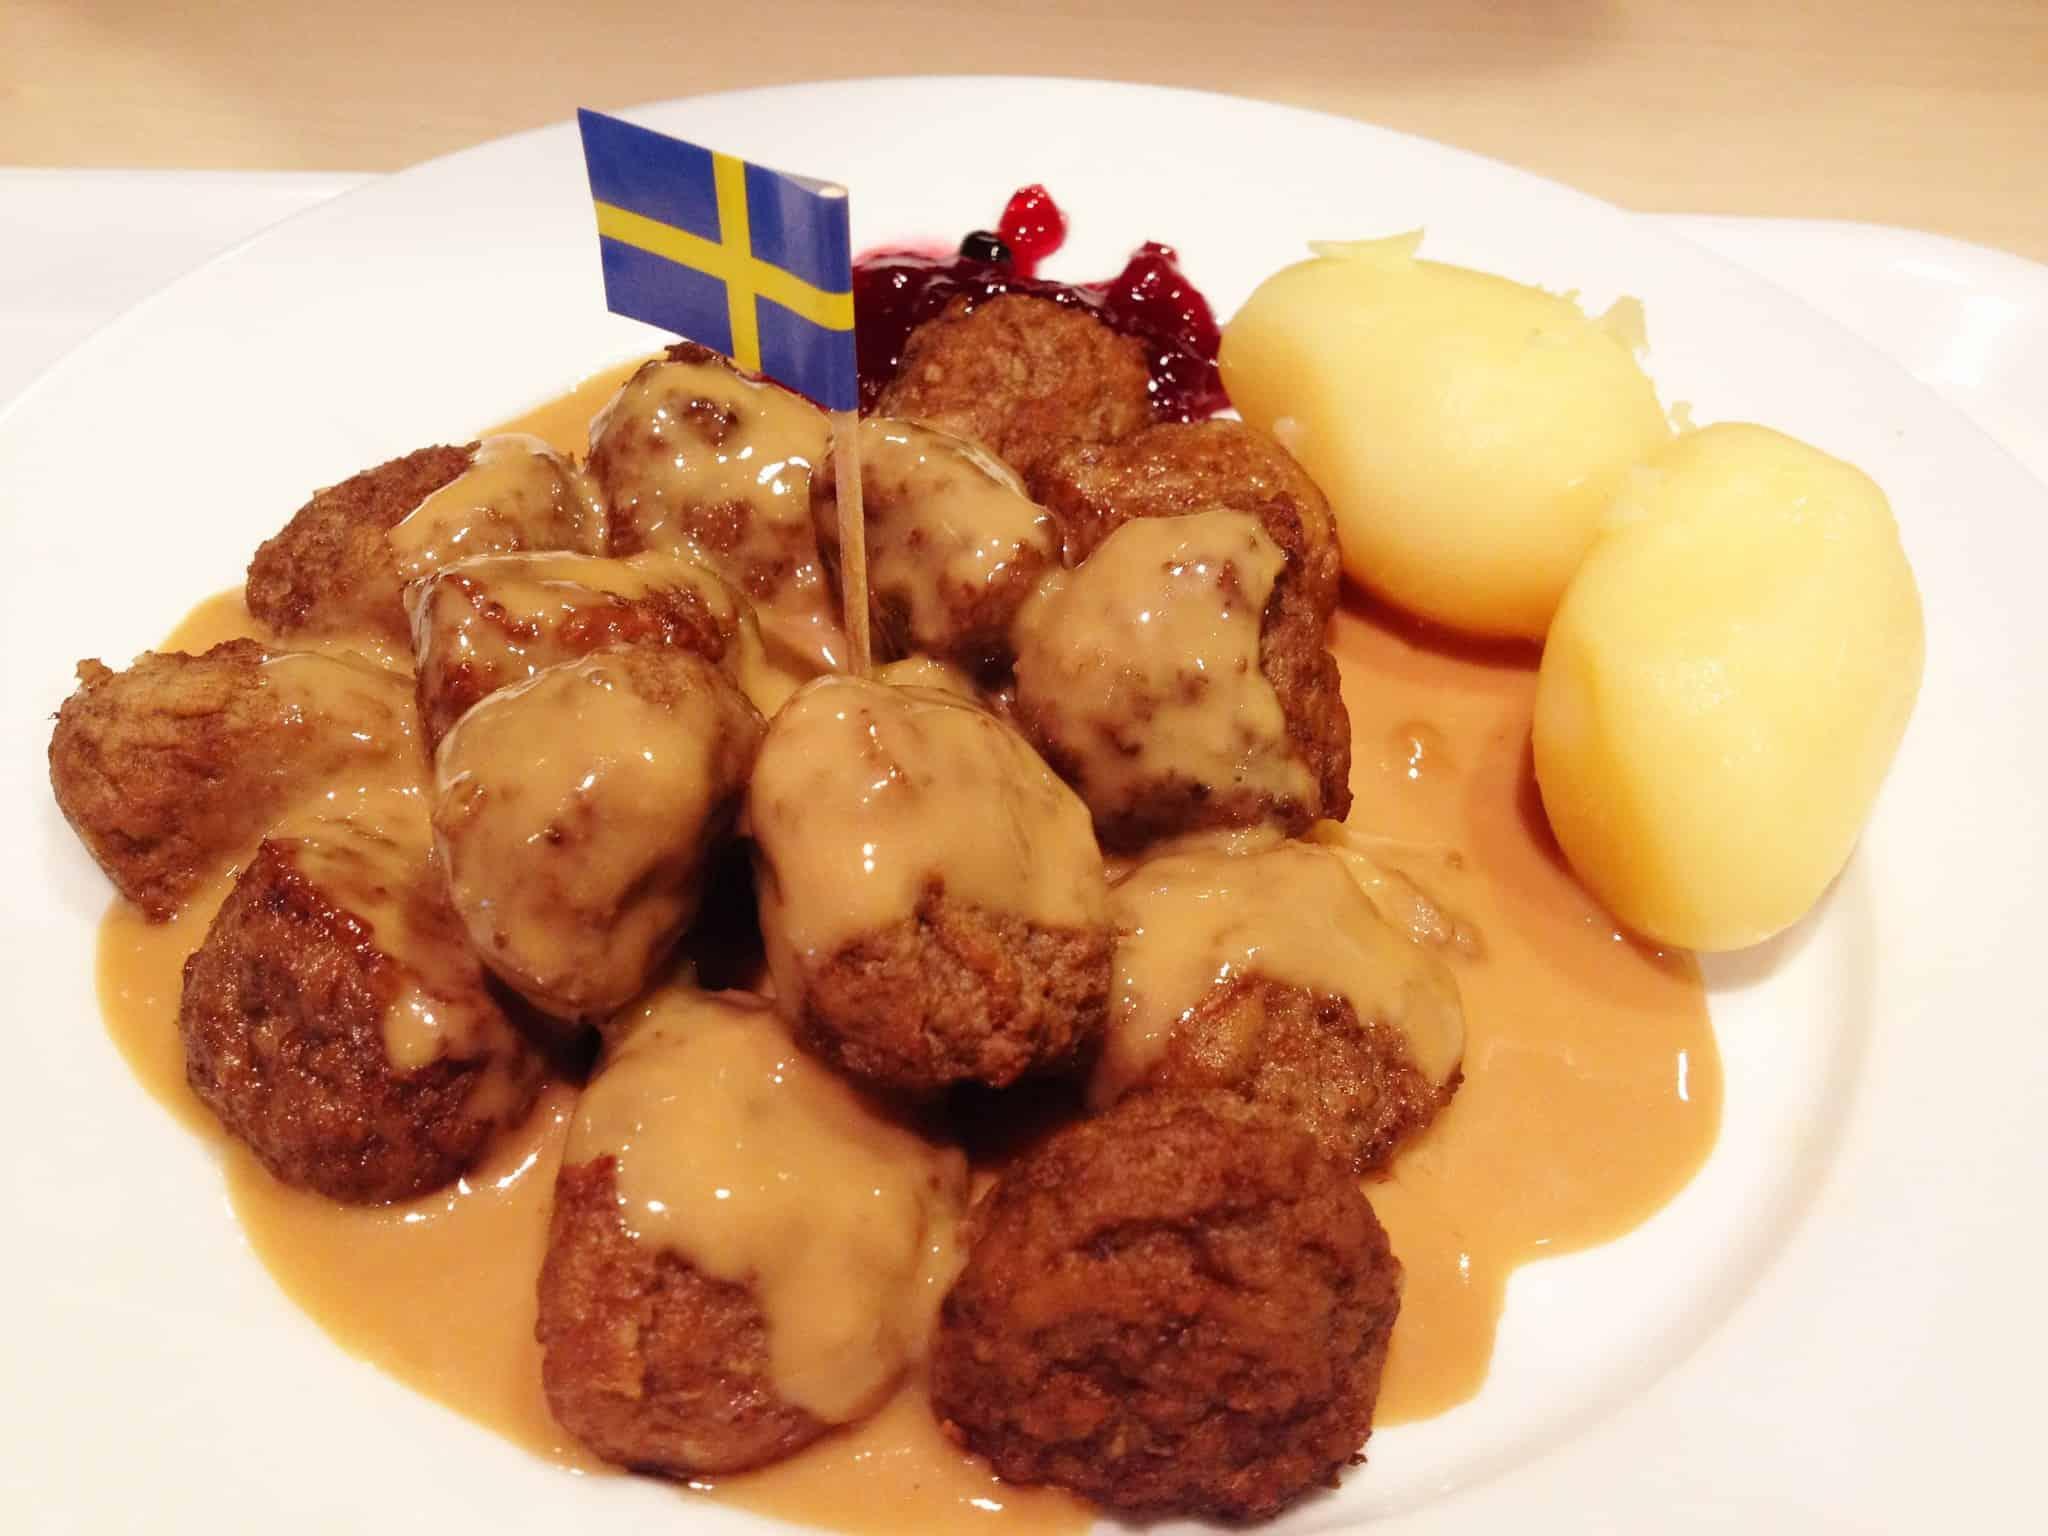 IKEA's Swedish meatballs | Photo: © Karl Baron / Flickr fast food